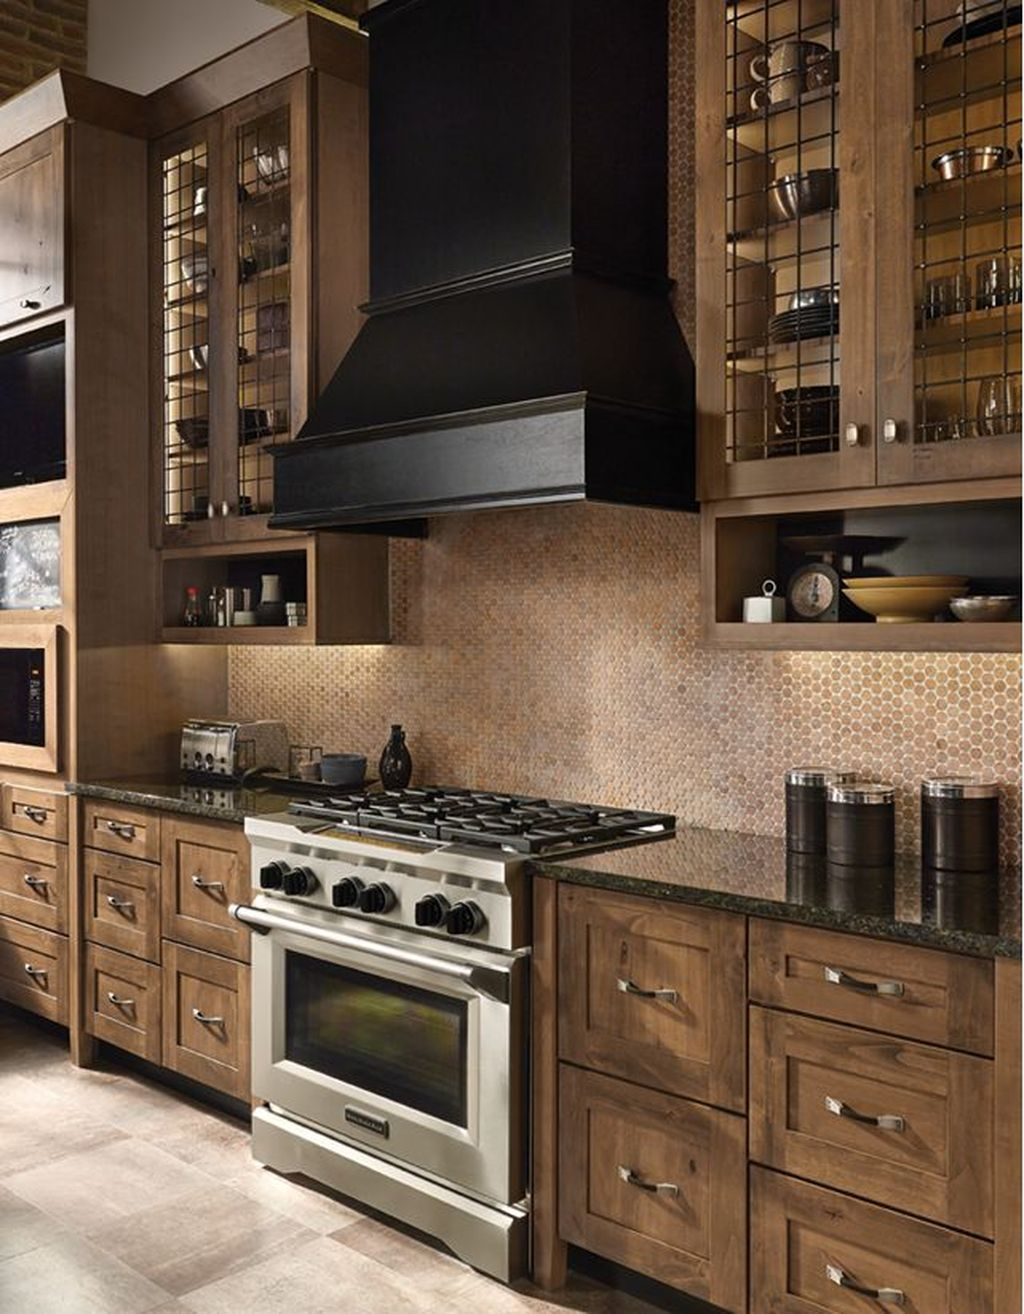 37 inspiring farmhouse style kitchen cabinets design ideas farmhouse style kitchen cabinets on kitchen cabinets rustic farmhouse style id=25245